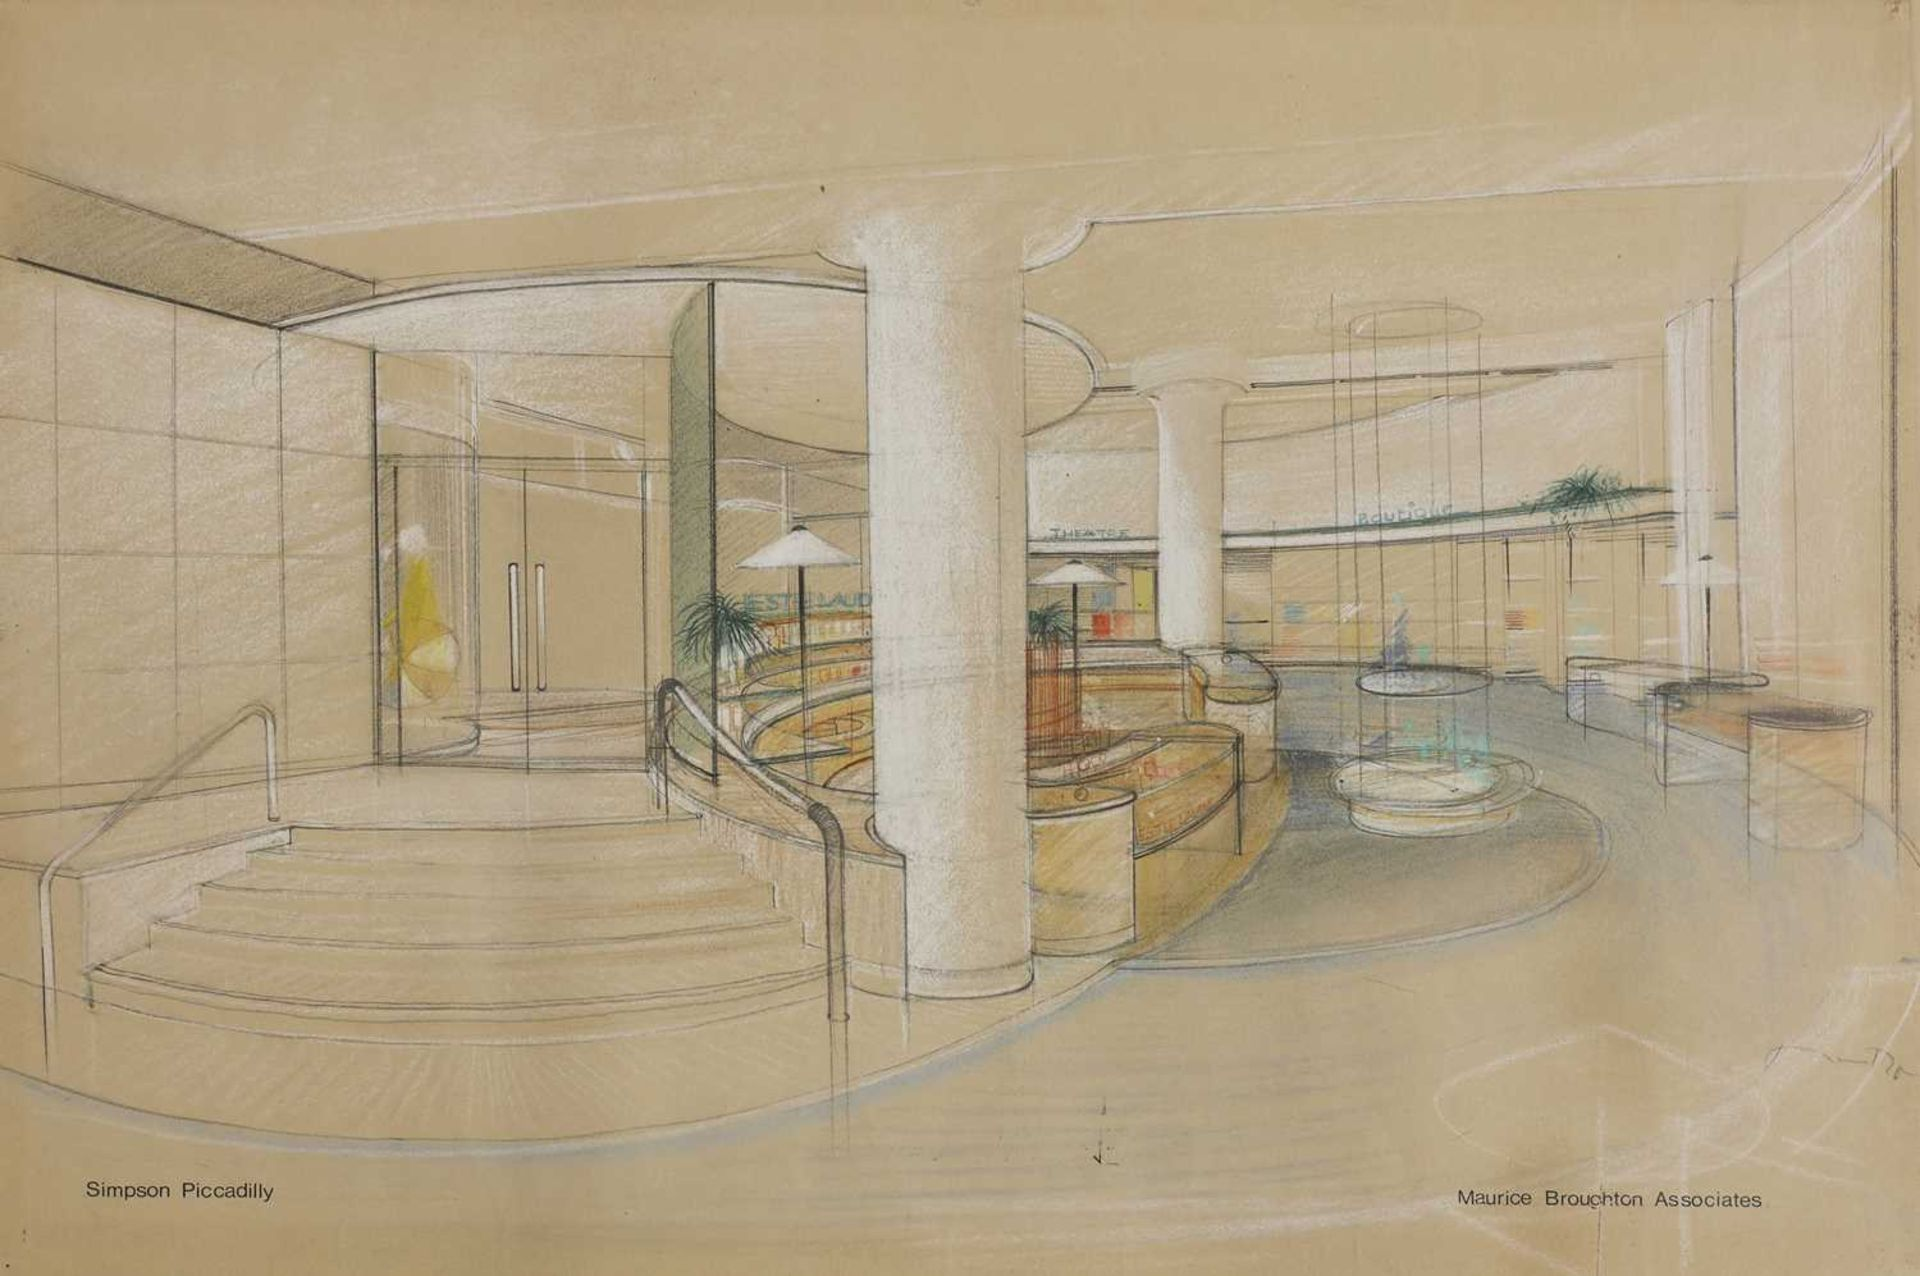 Maurice Broughton Associates, - Image 4 of 7